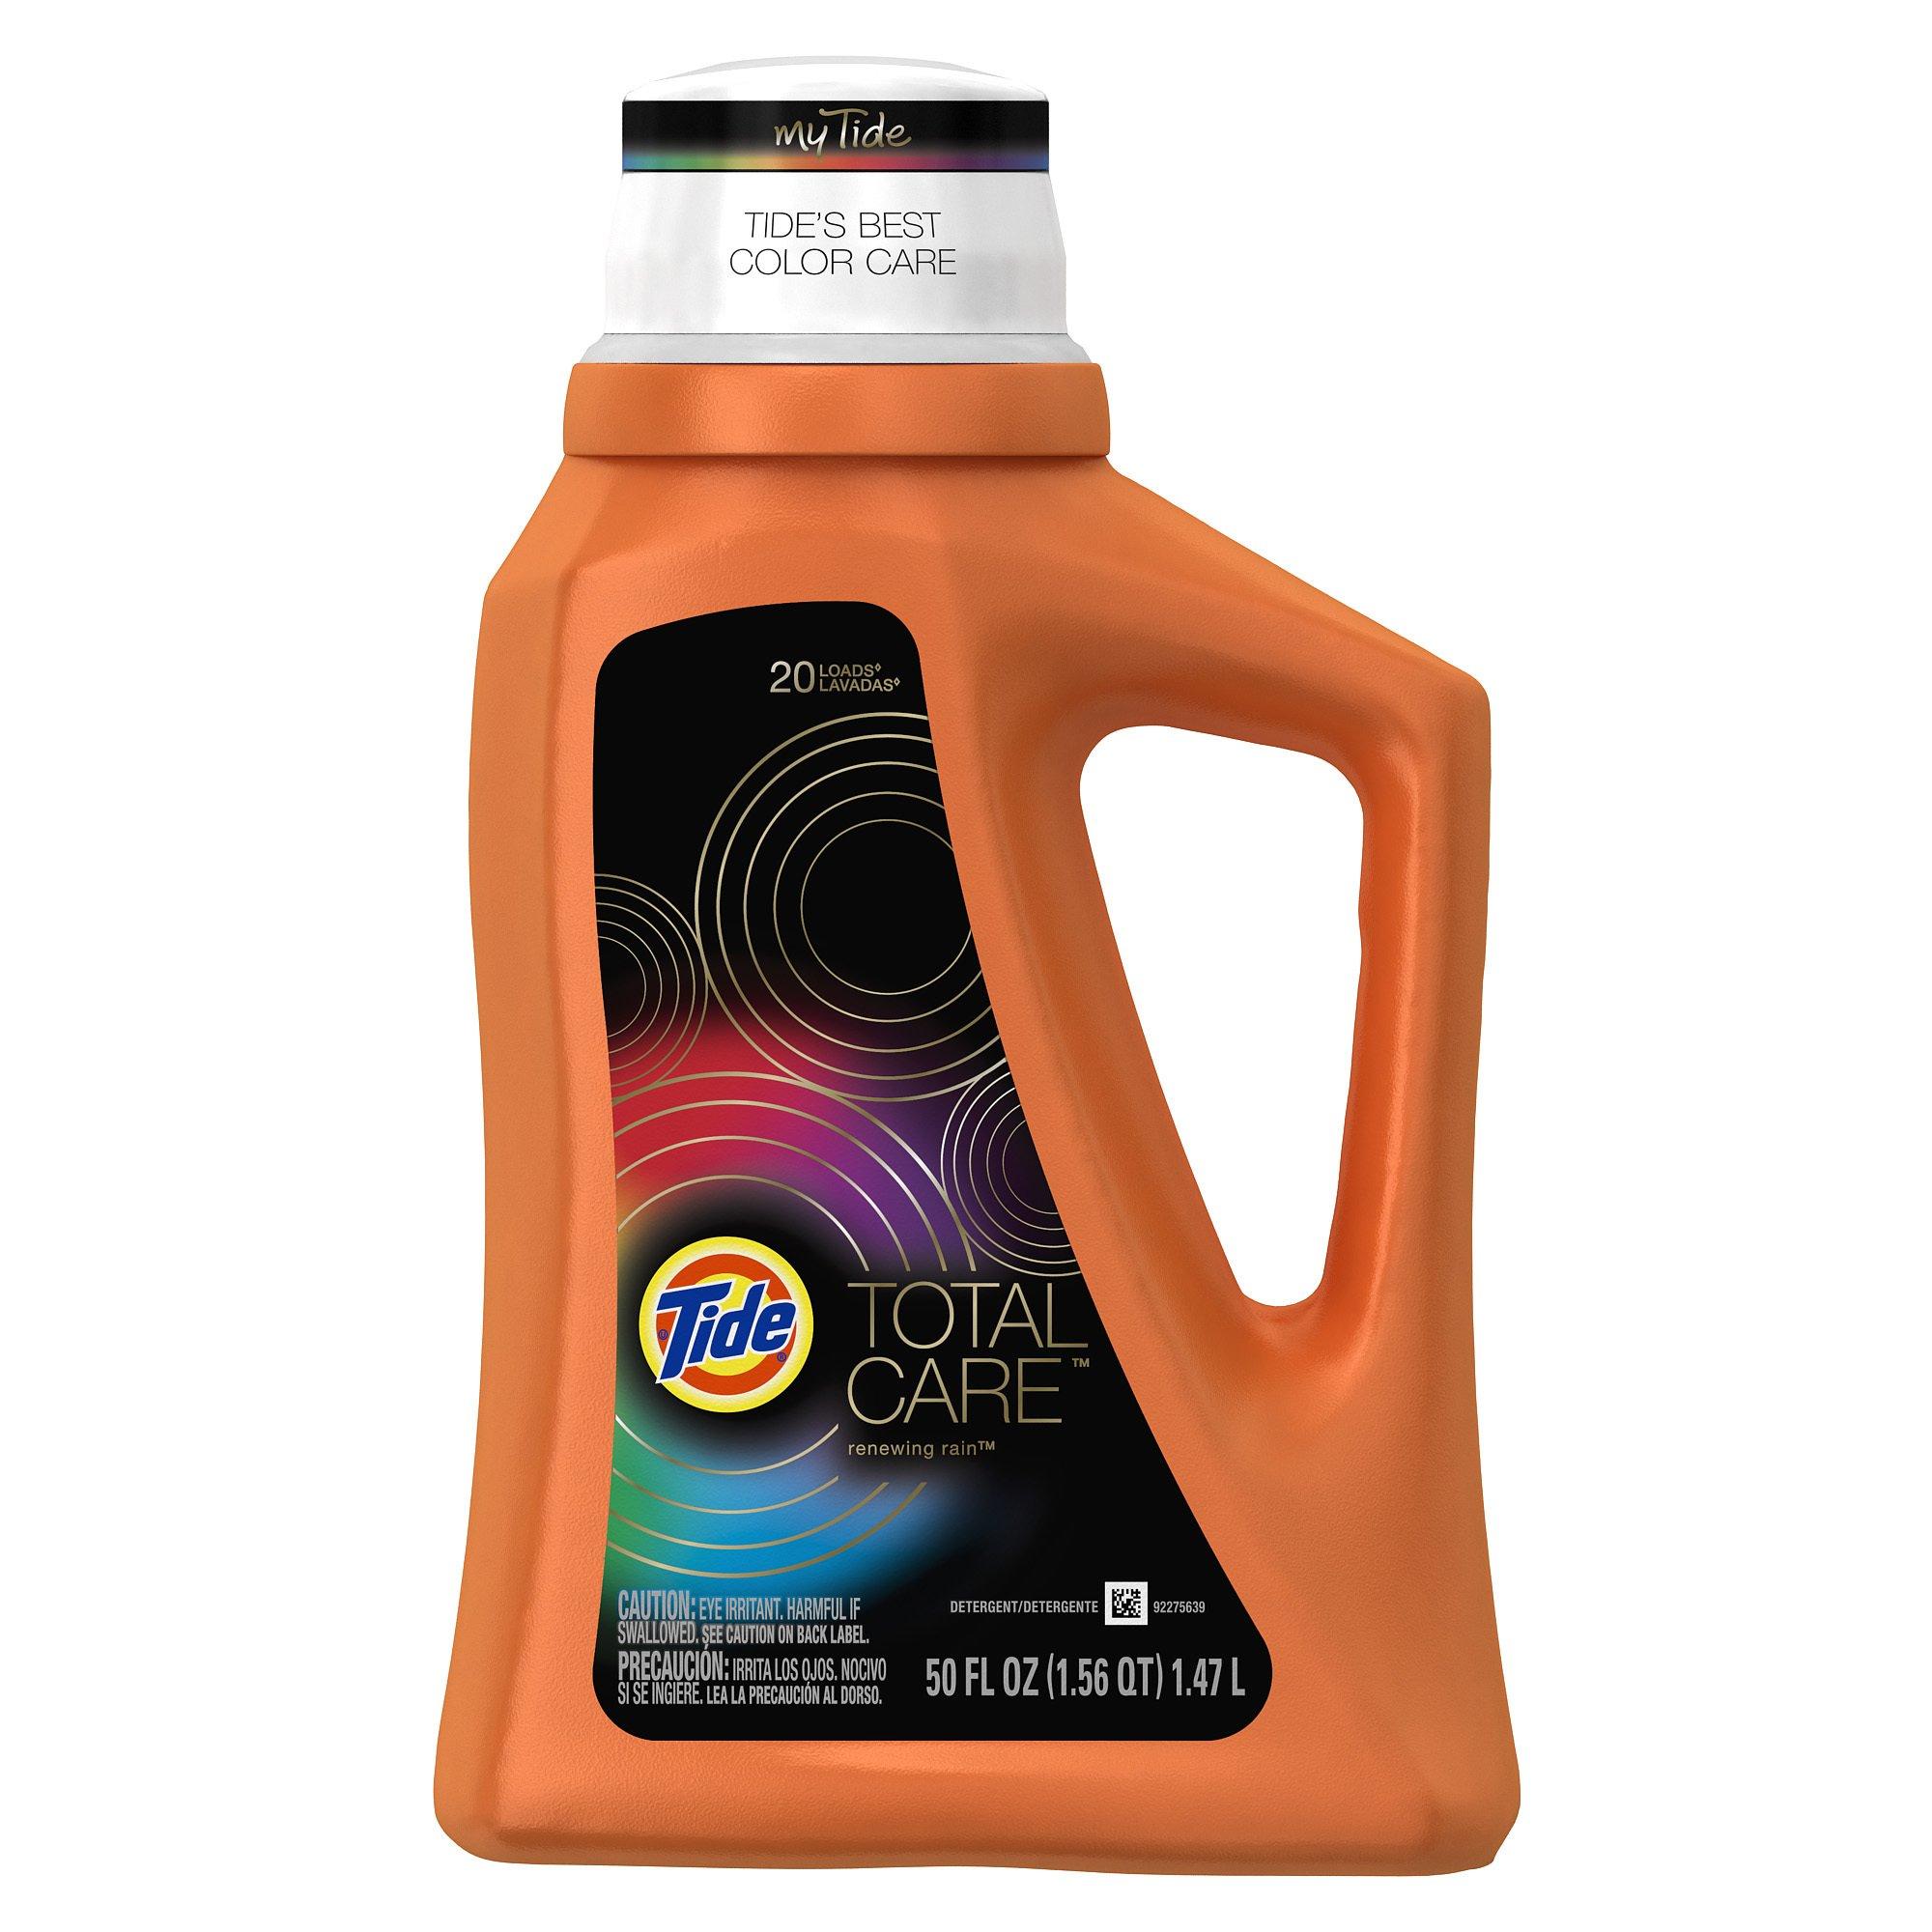 Tide Total Care Renewing Rain Scent Liquid Laundry Detergent 50 Fl Oz